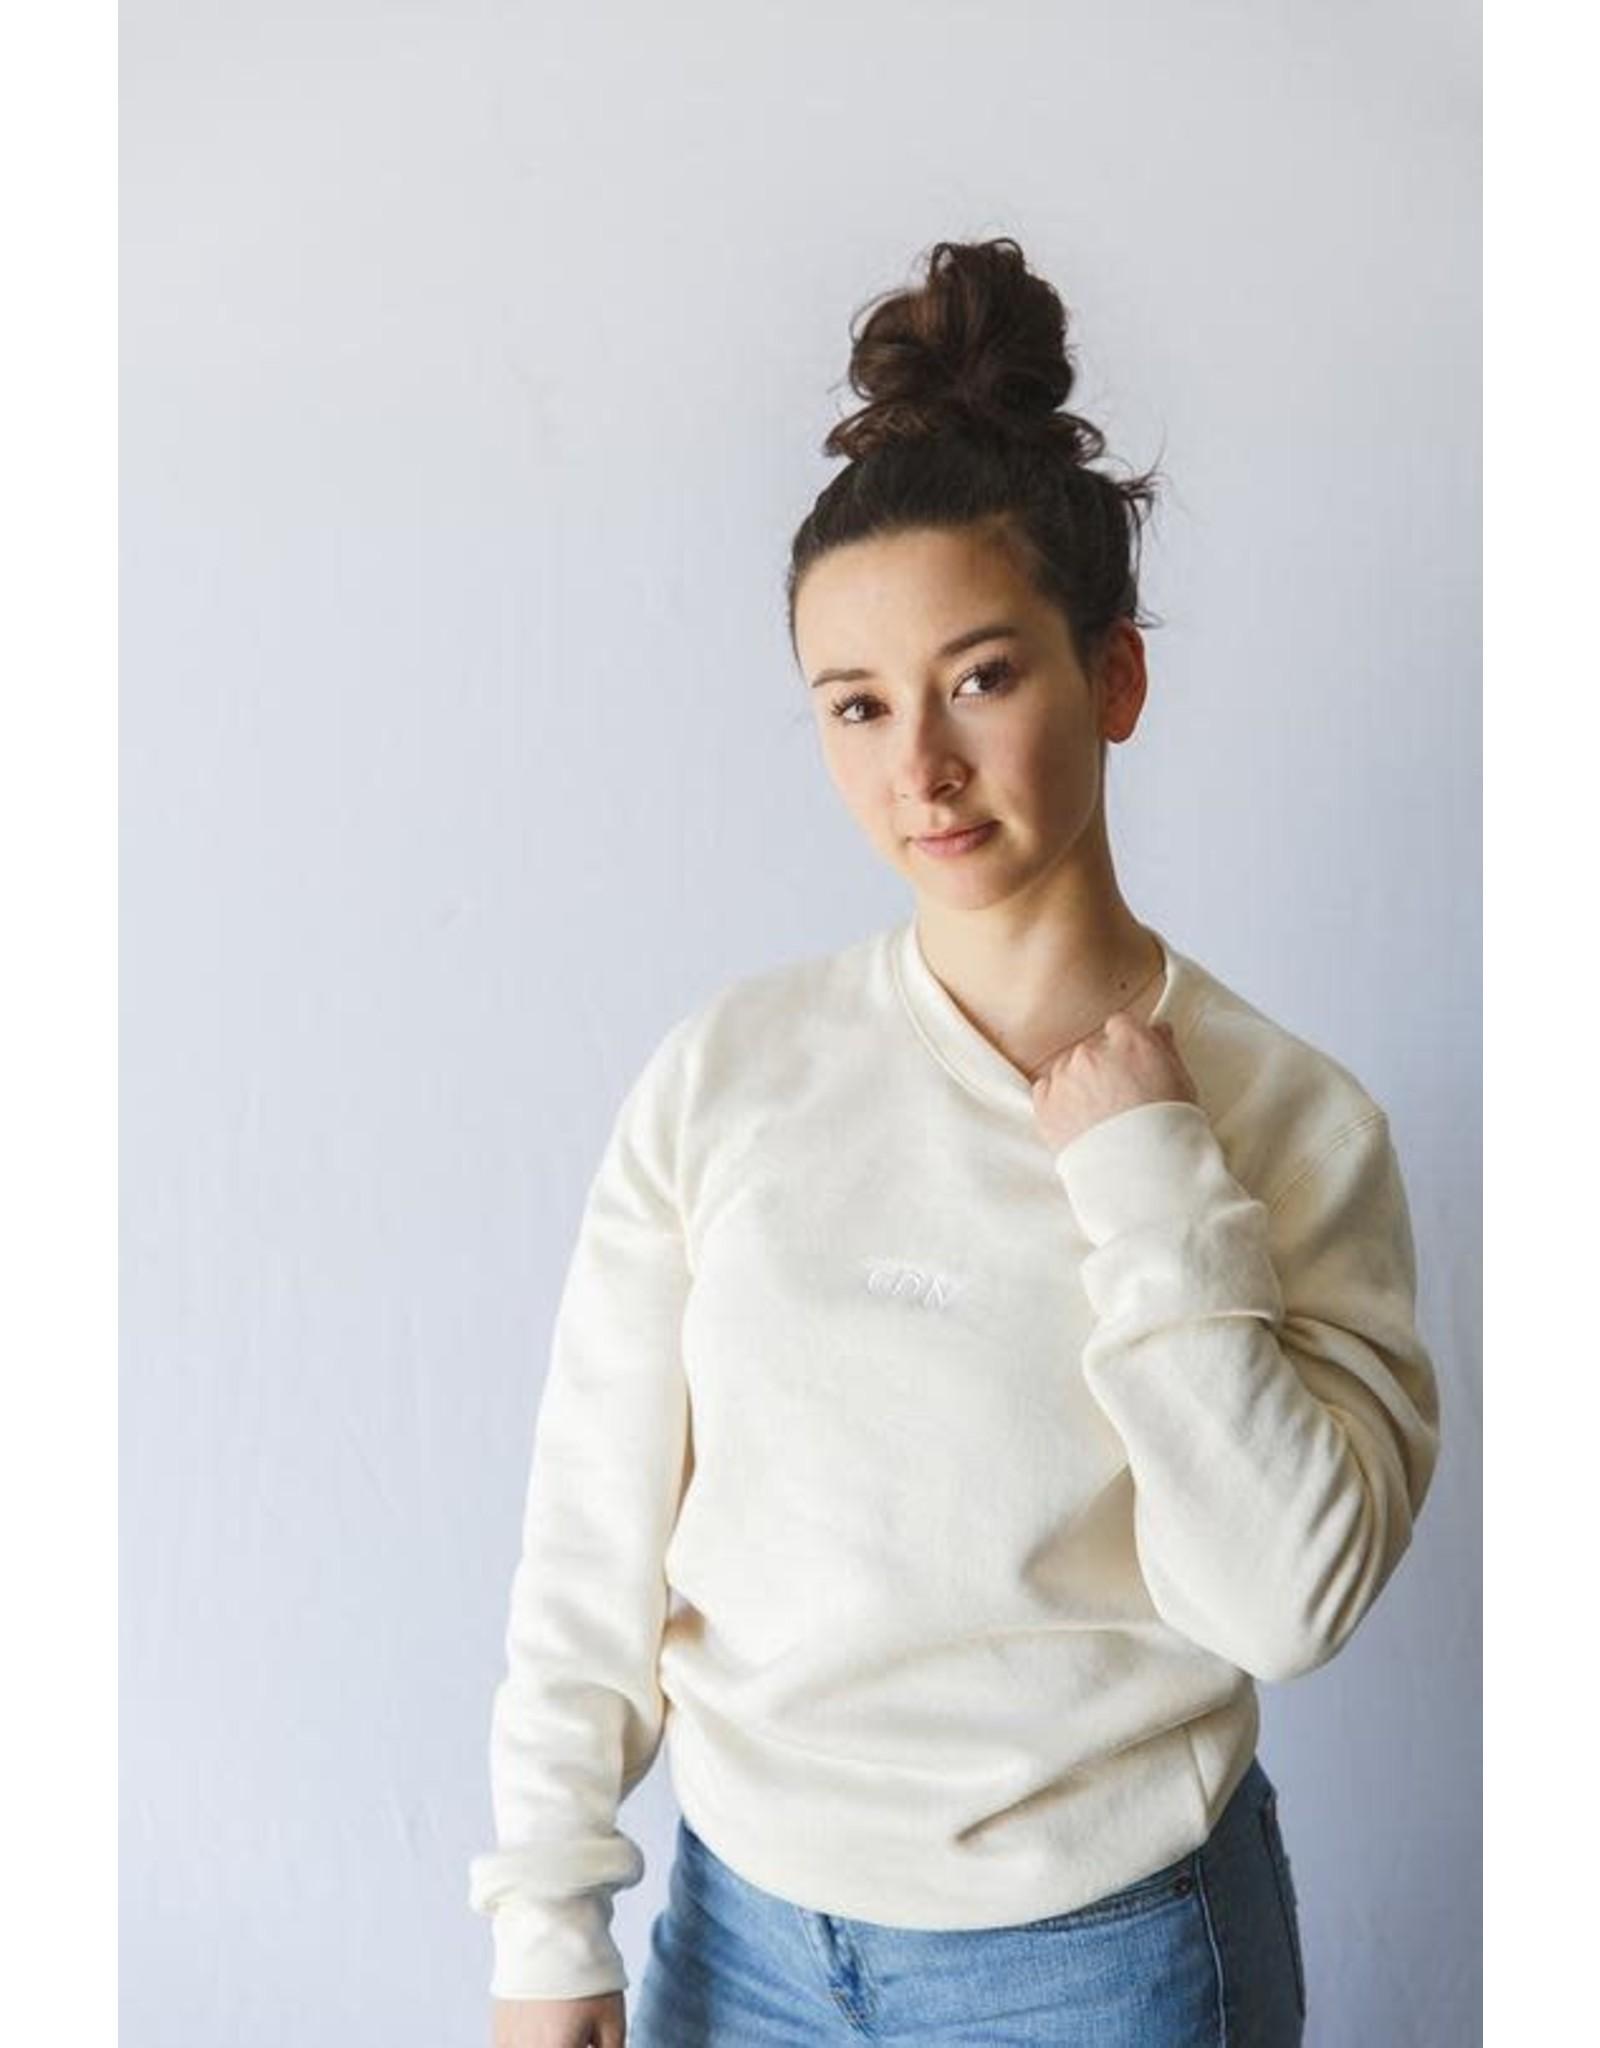 CDN Unisex Oatmeal Bamboo Stitch Crewneck - Sweater